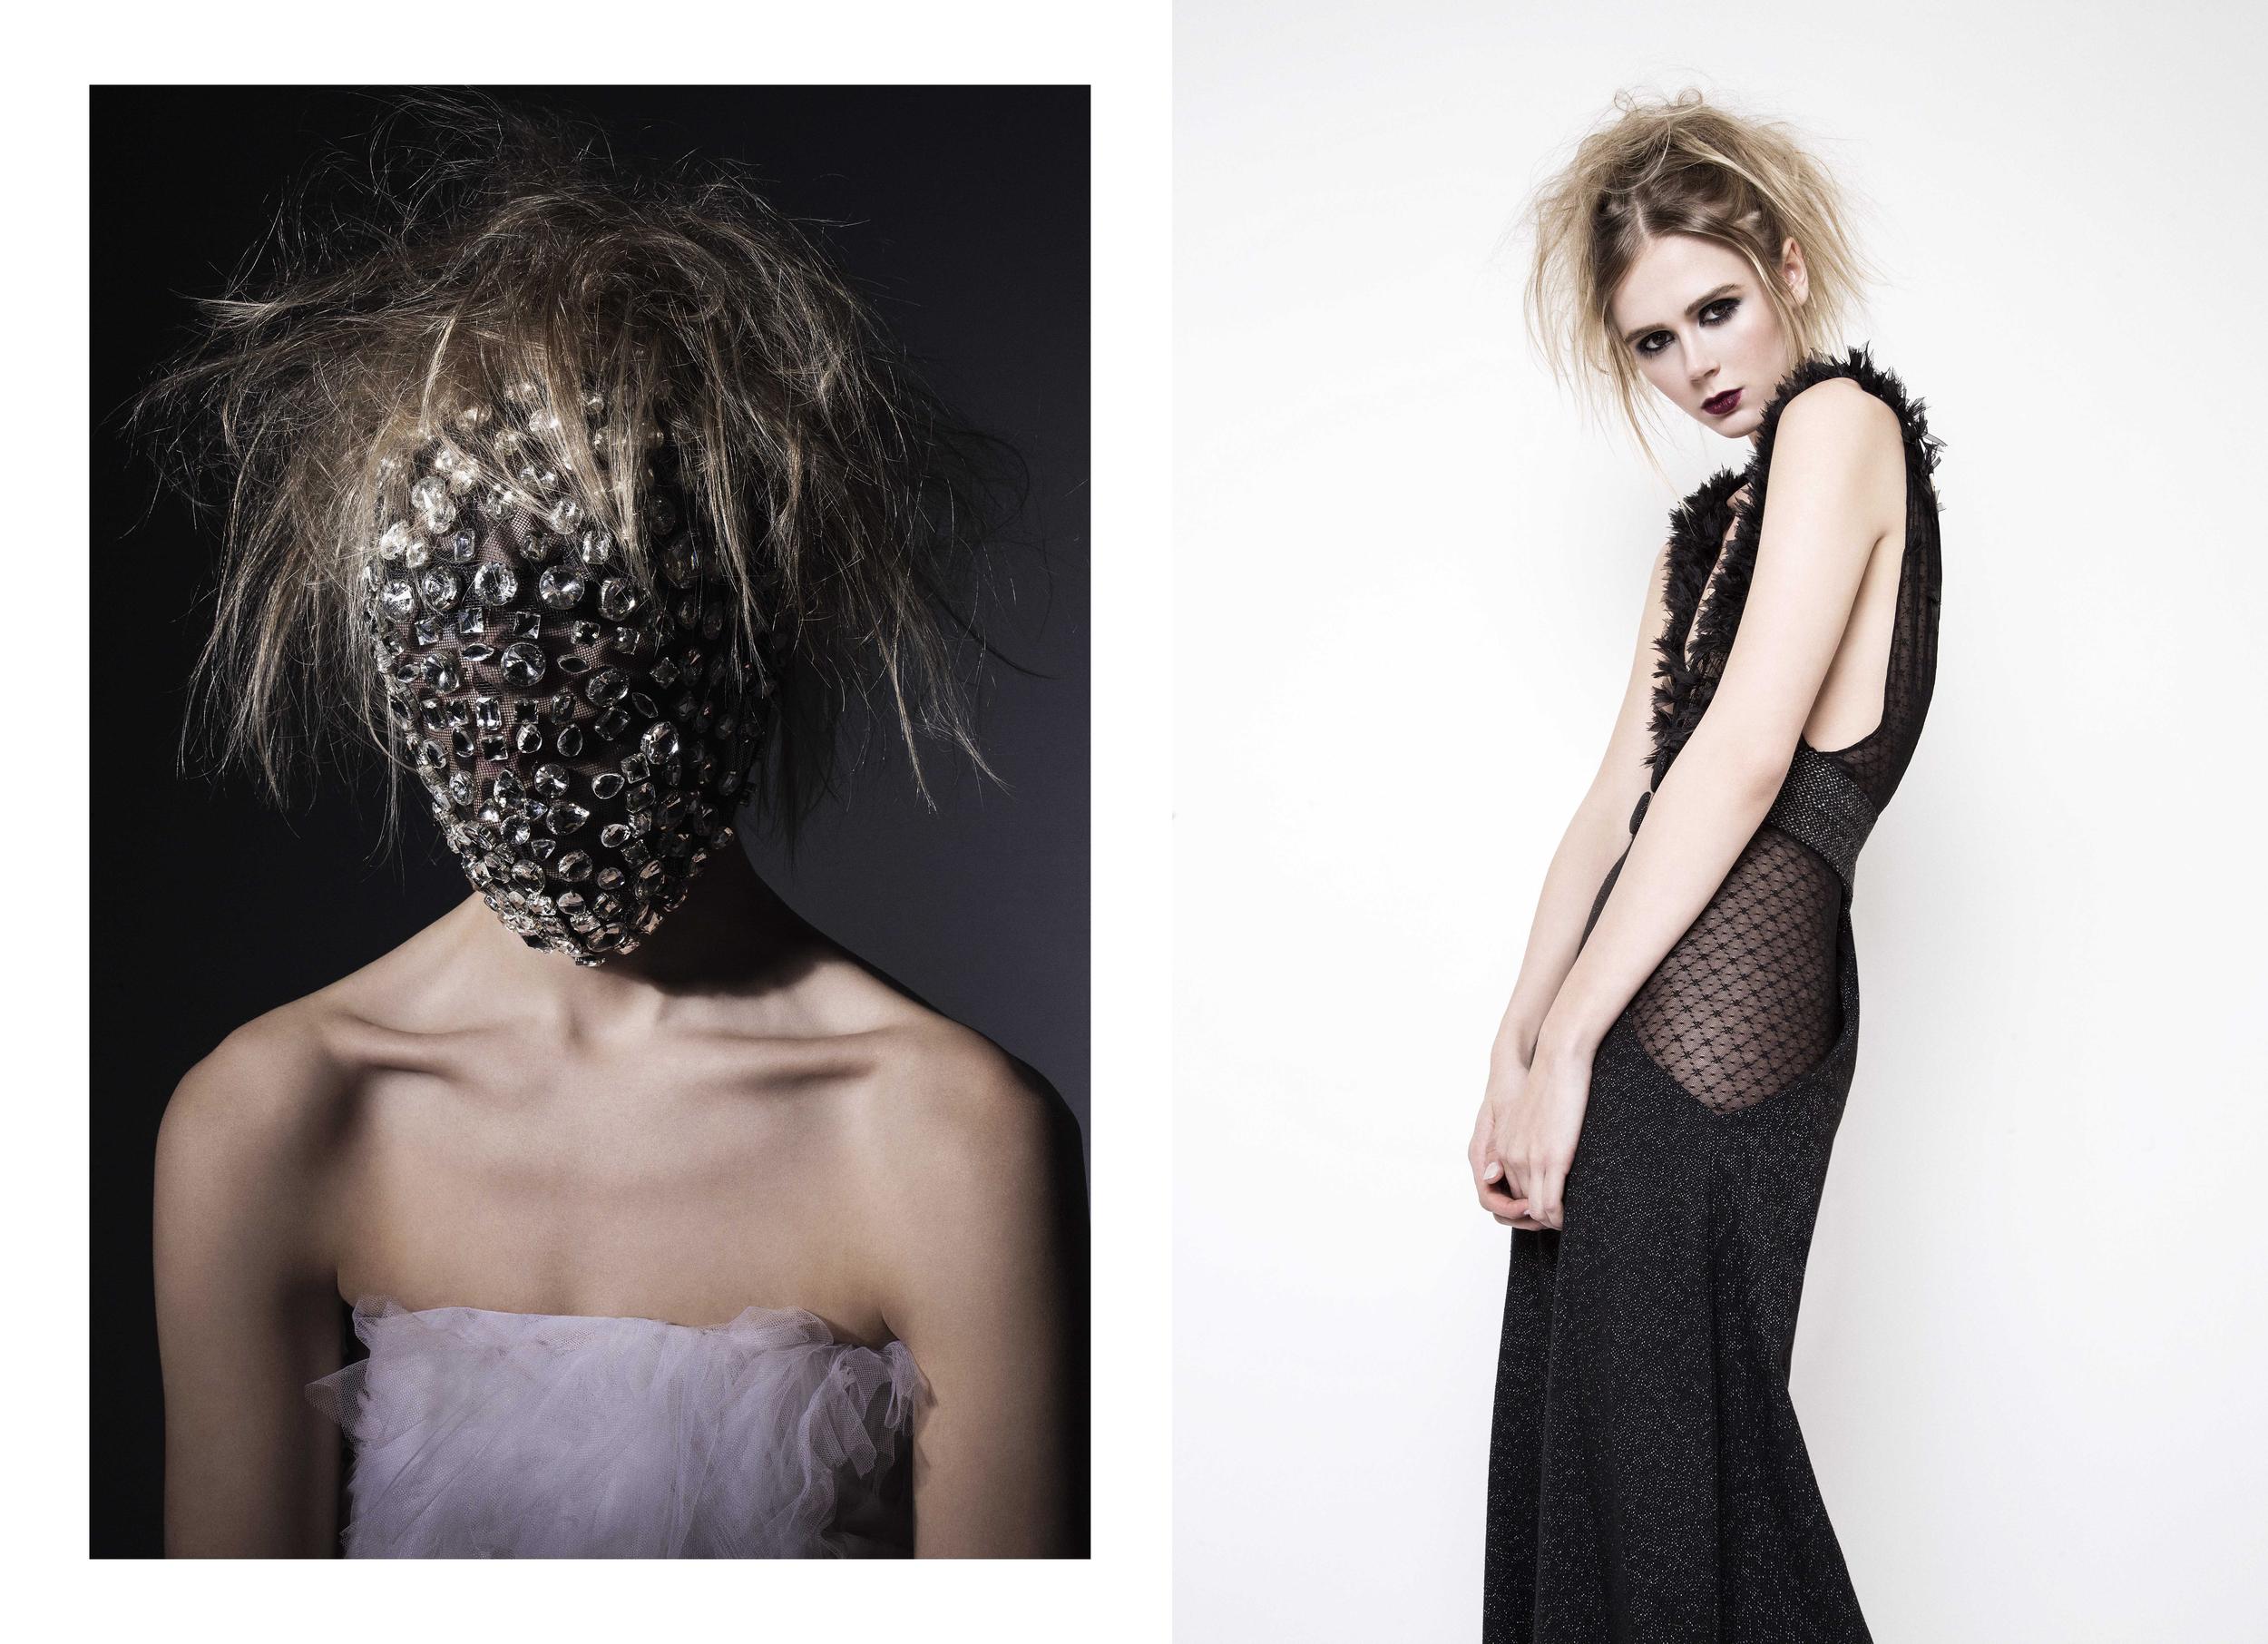 Left - Dress : Jad Ghandour / Headpiece : Cutting Edge Archives Right - Jumpsuit : Roel Rosal